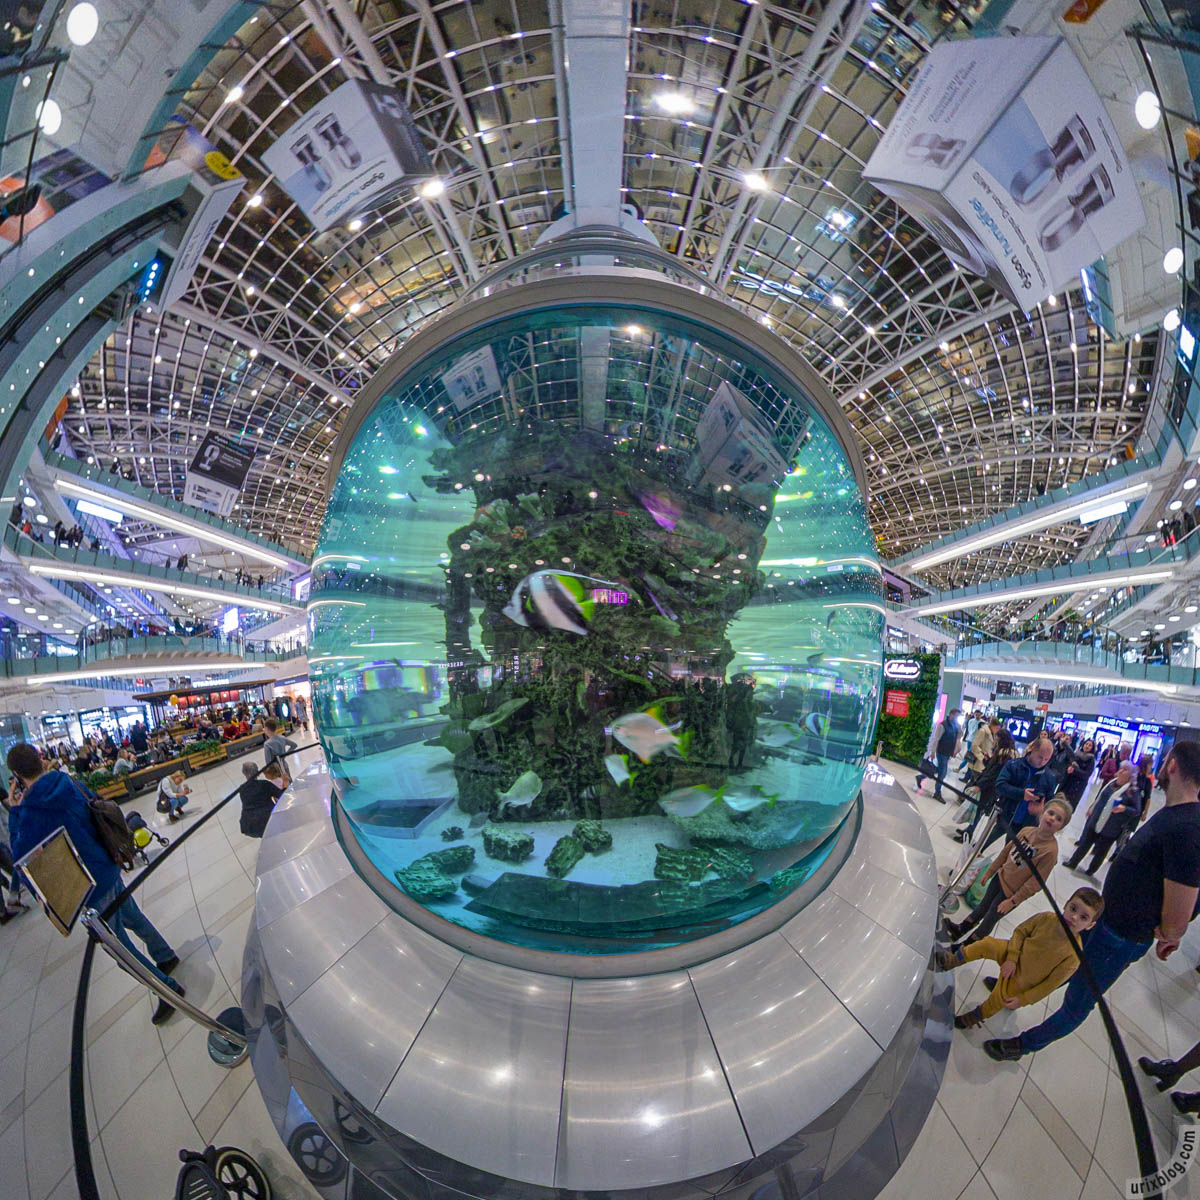 Аквариум, Авиапарк, Москва, Россия, фишай, панорама, Insta360 One X, 2019